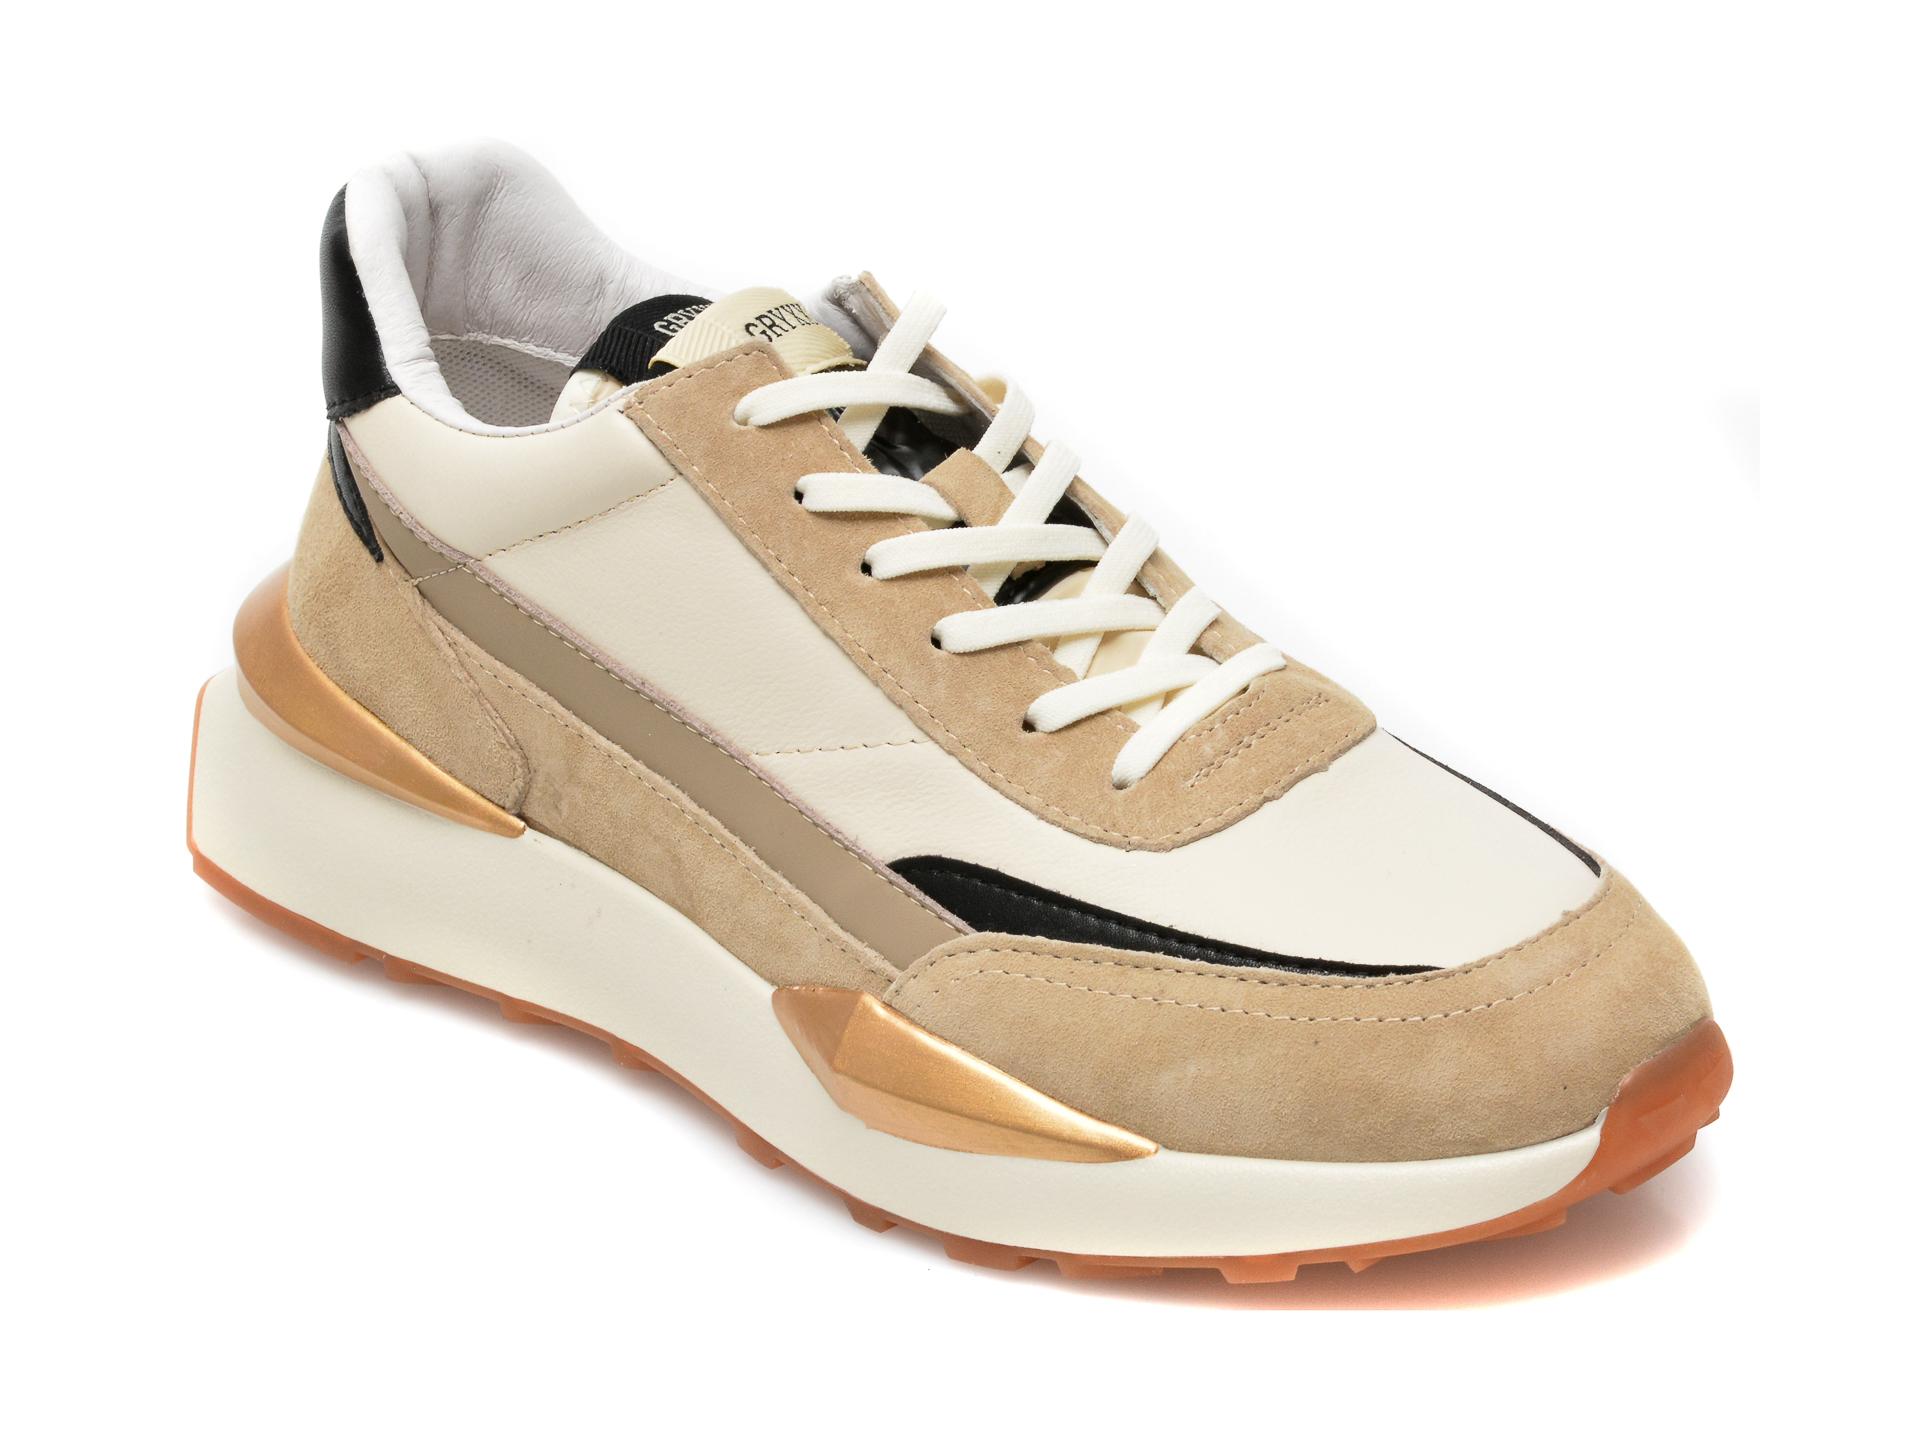 Pantofi sport GRYXX bej, 20735, din piele naturala imagine